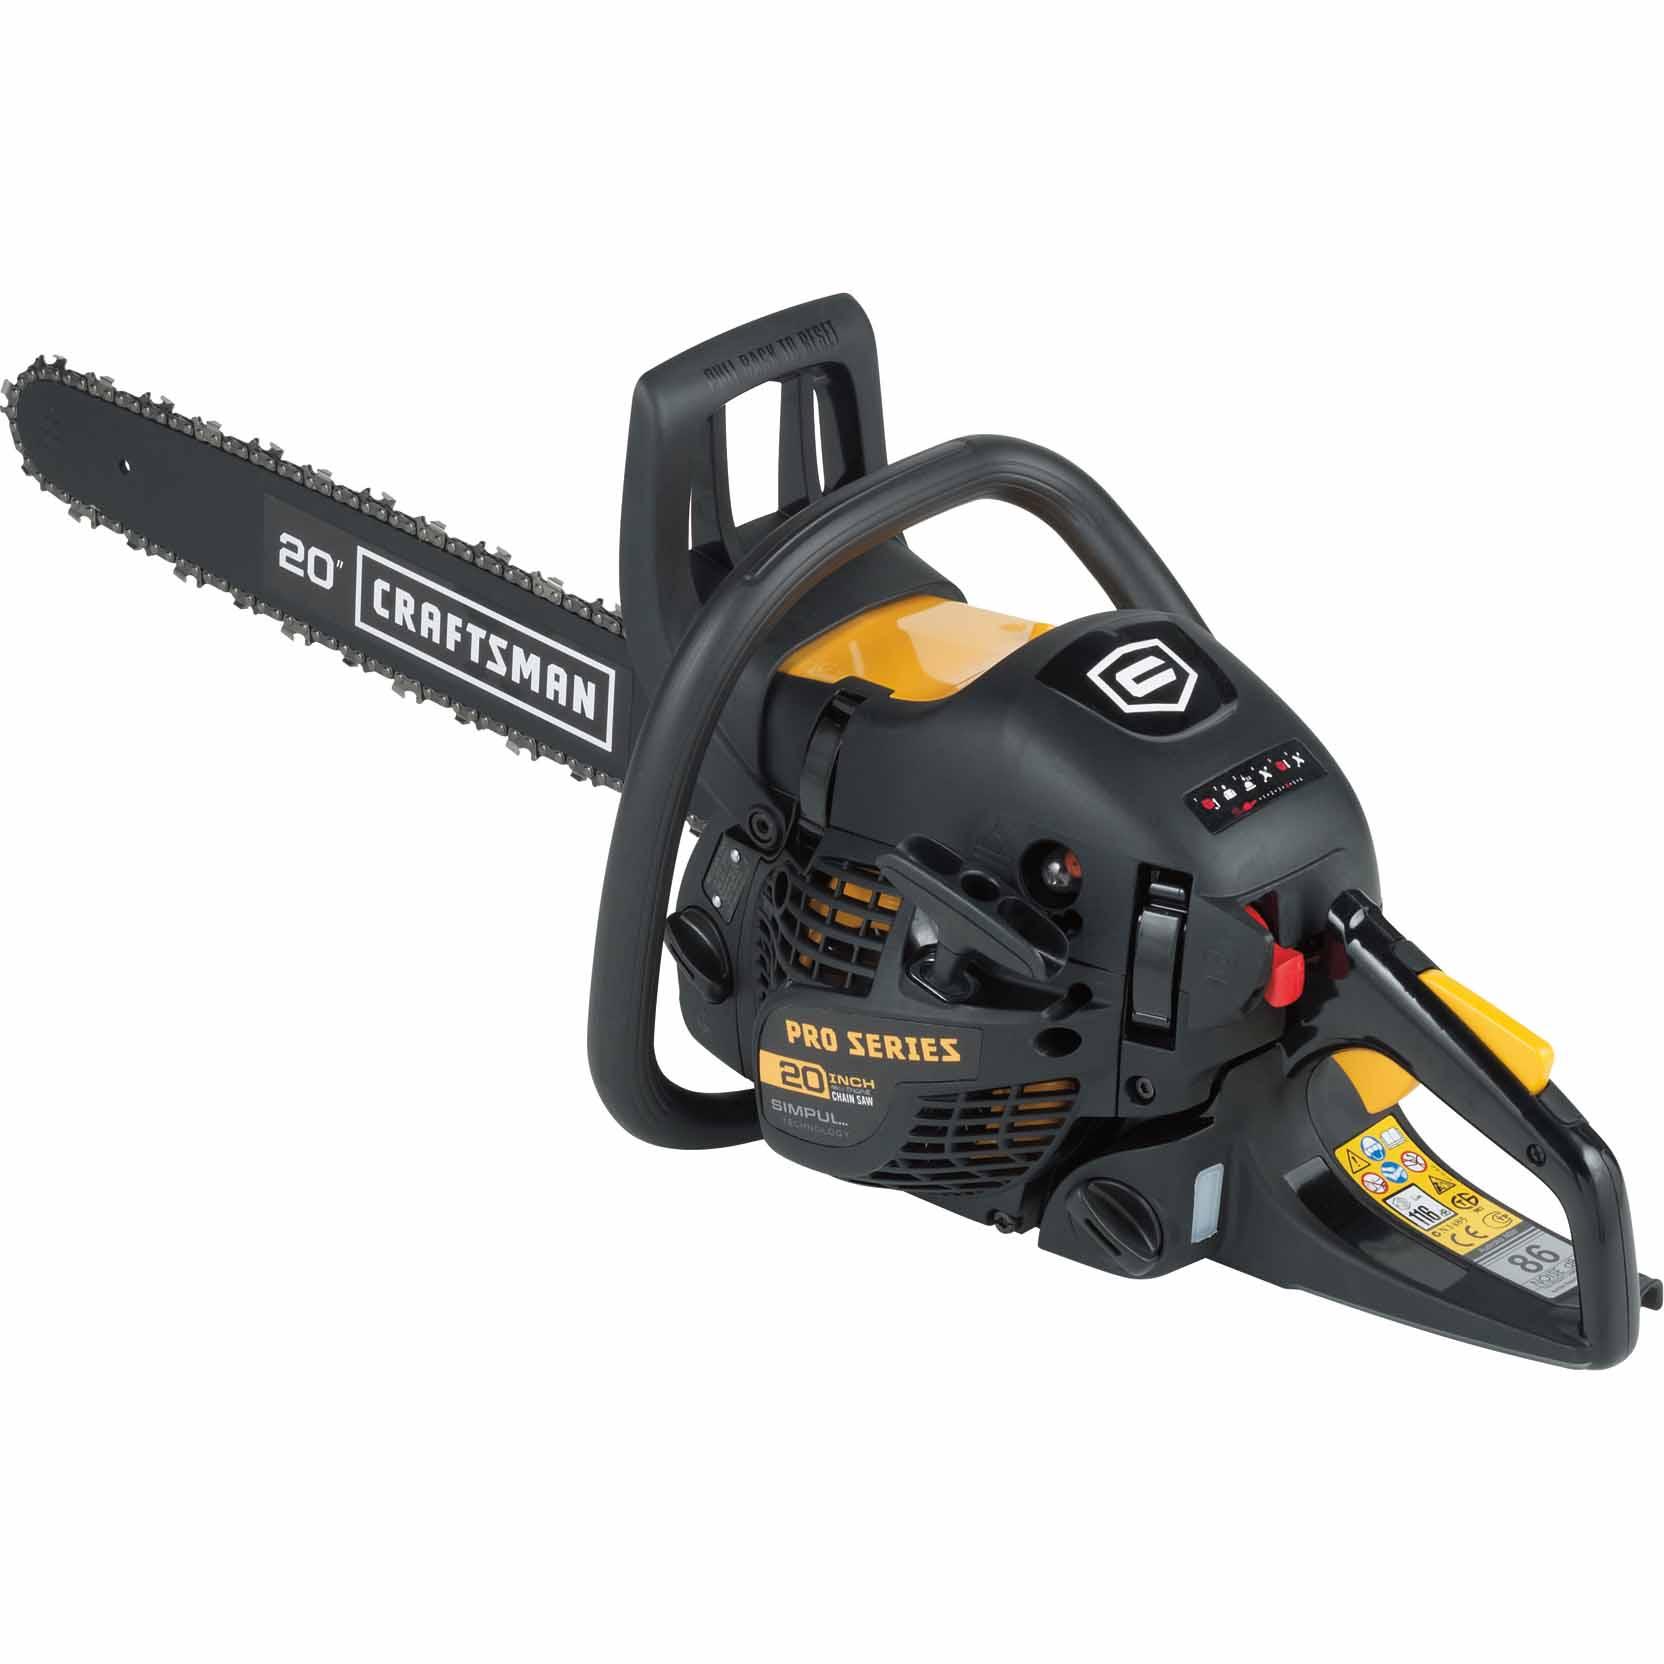 Craftsman Proseries 358382000 20 Gas Chainsaw1646003912 In 2020 Gas Chainsaw Craftsman Chainsaw